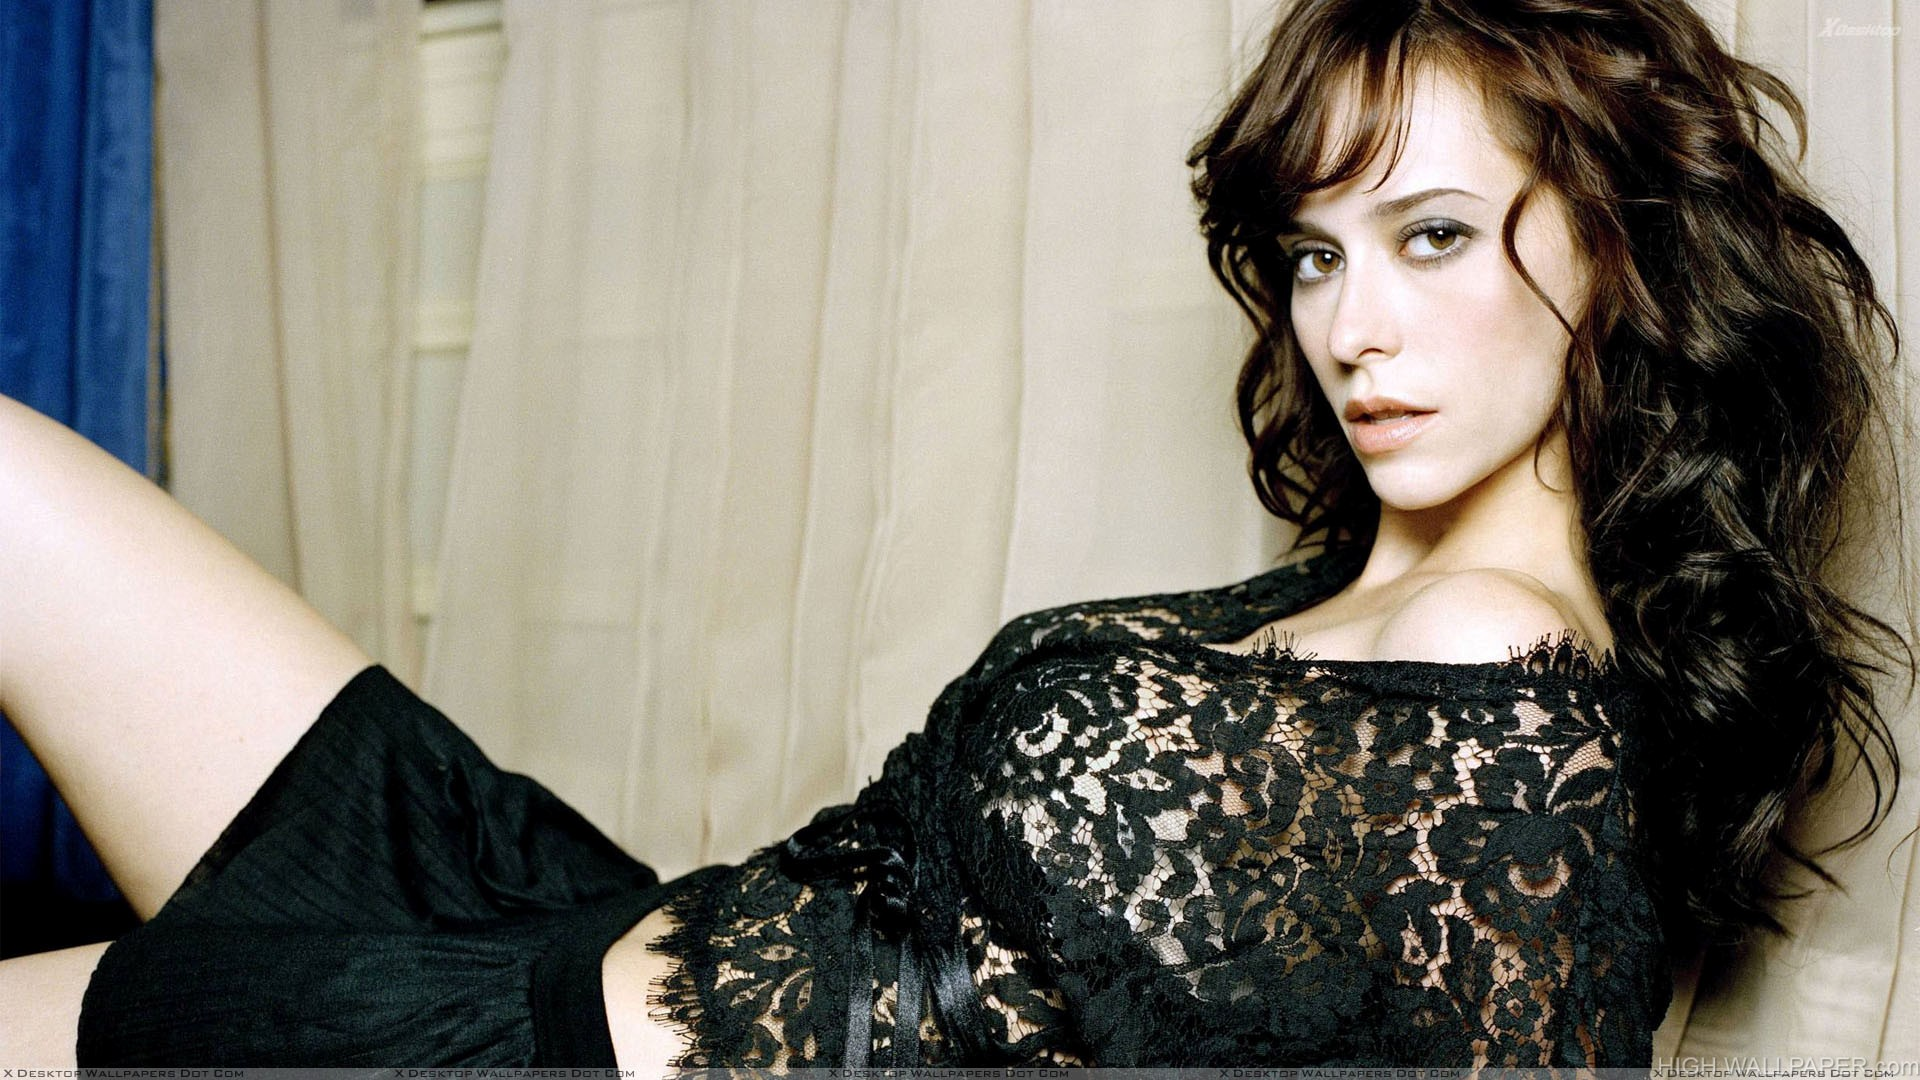 Jennifer Love Hewitt Laying Pose In Black Transparent Dress